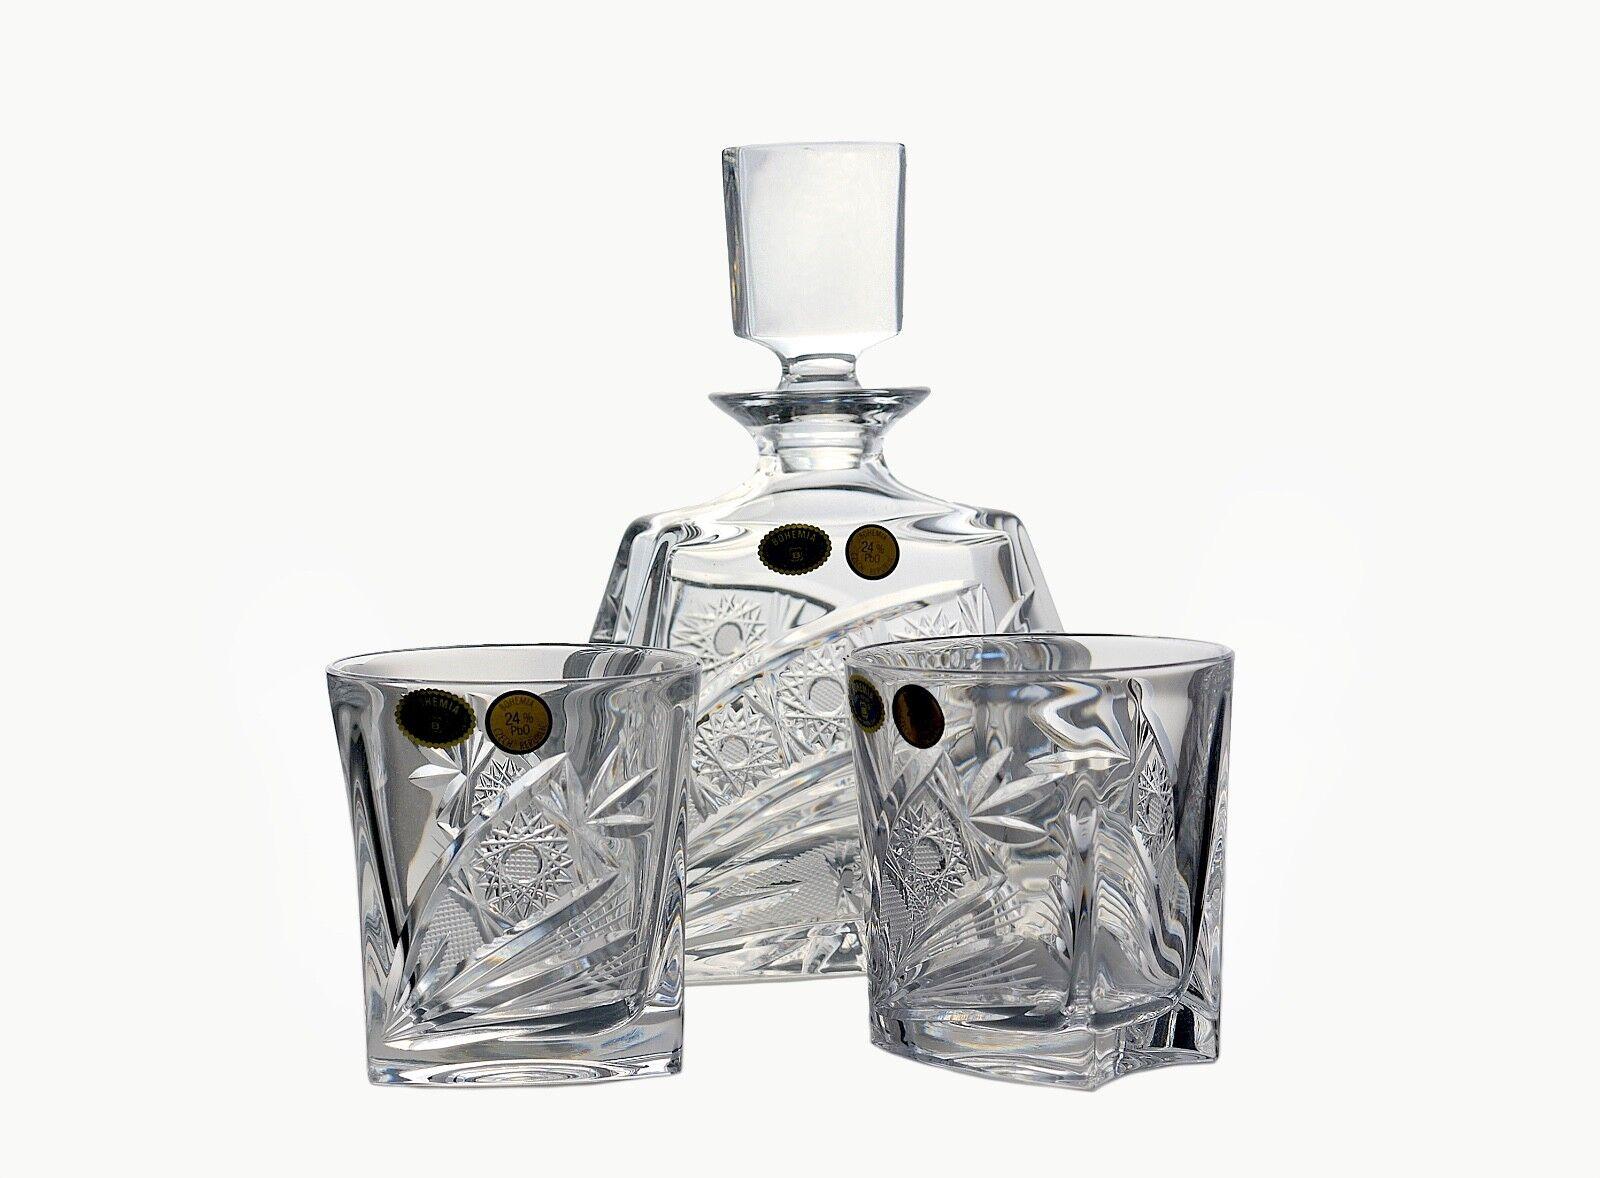 Ensemble pour Boisson Spiritueuse carafe +6 verres Bohemia bleikristall handgeschliffenes Décor